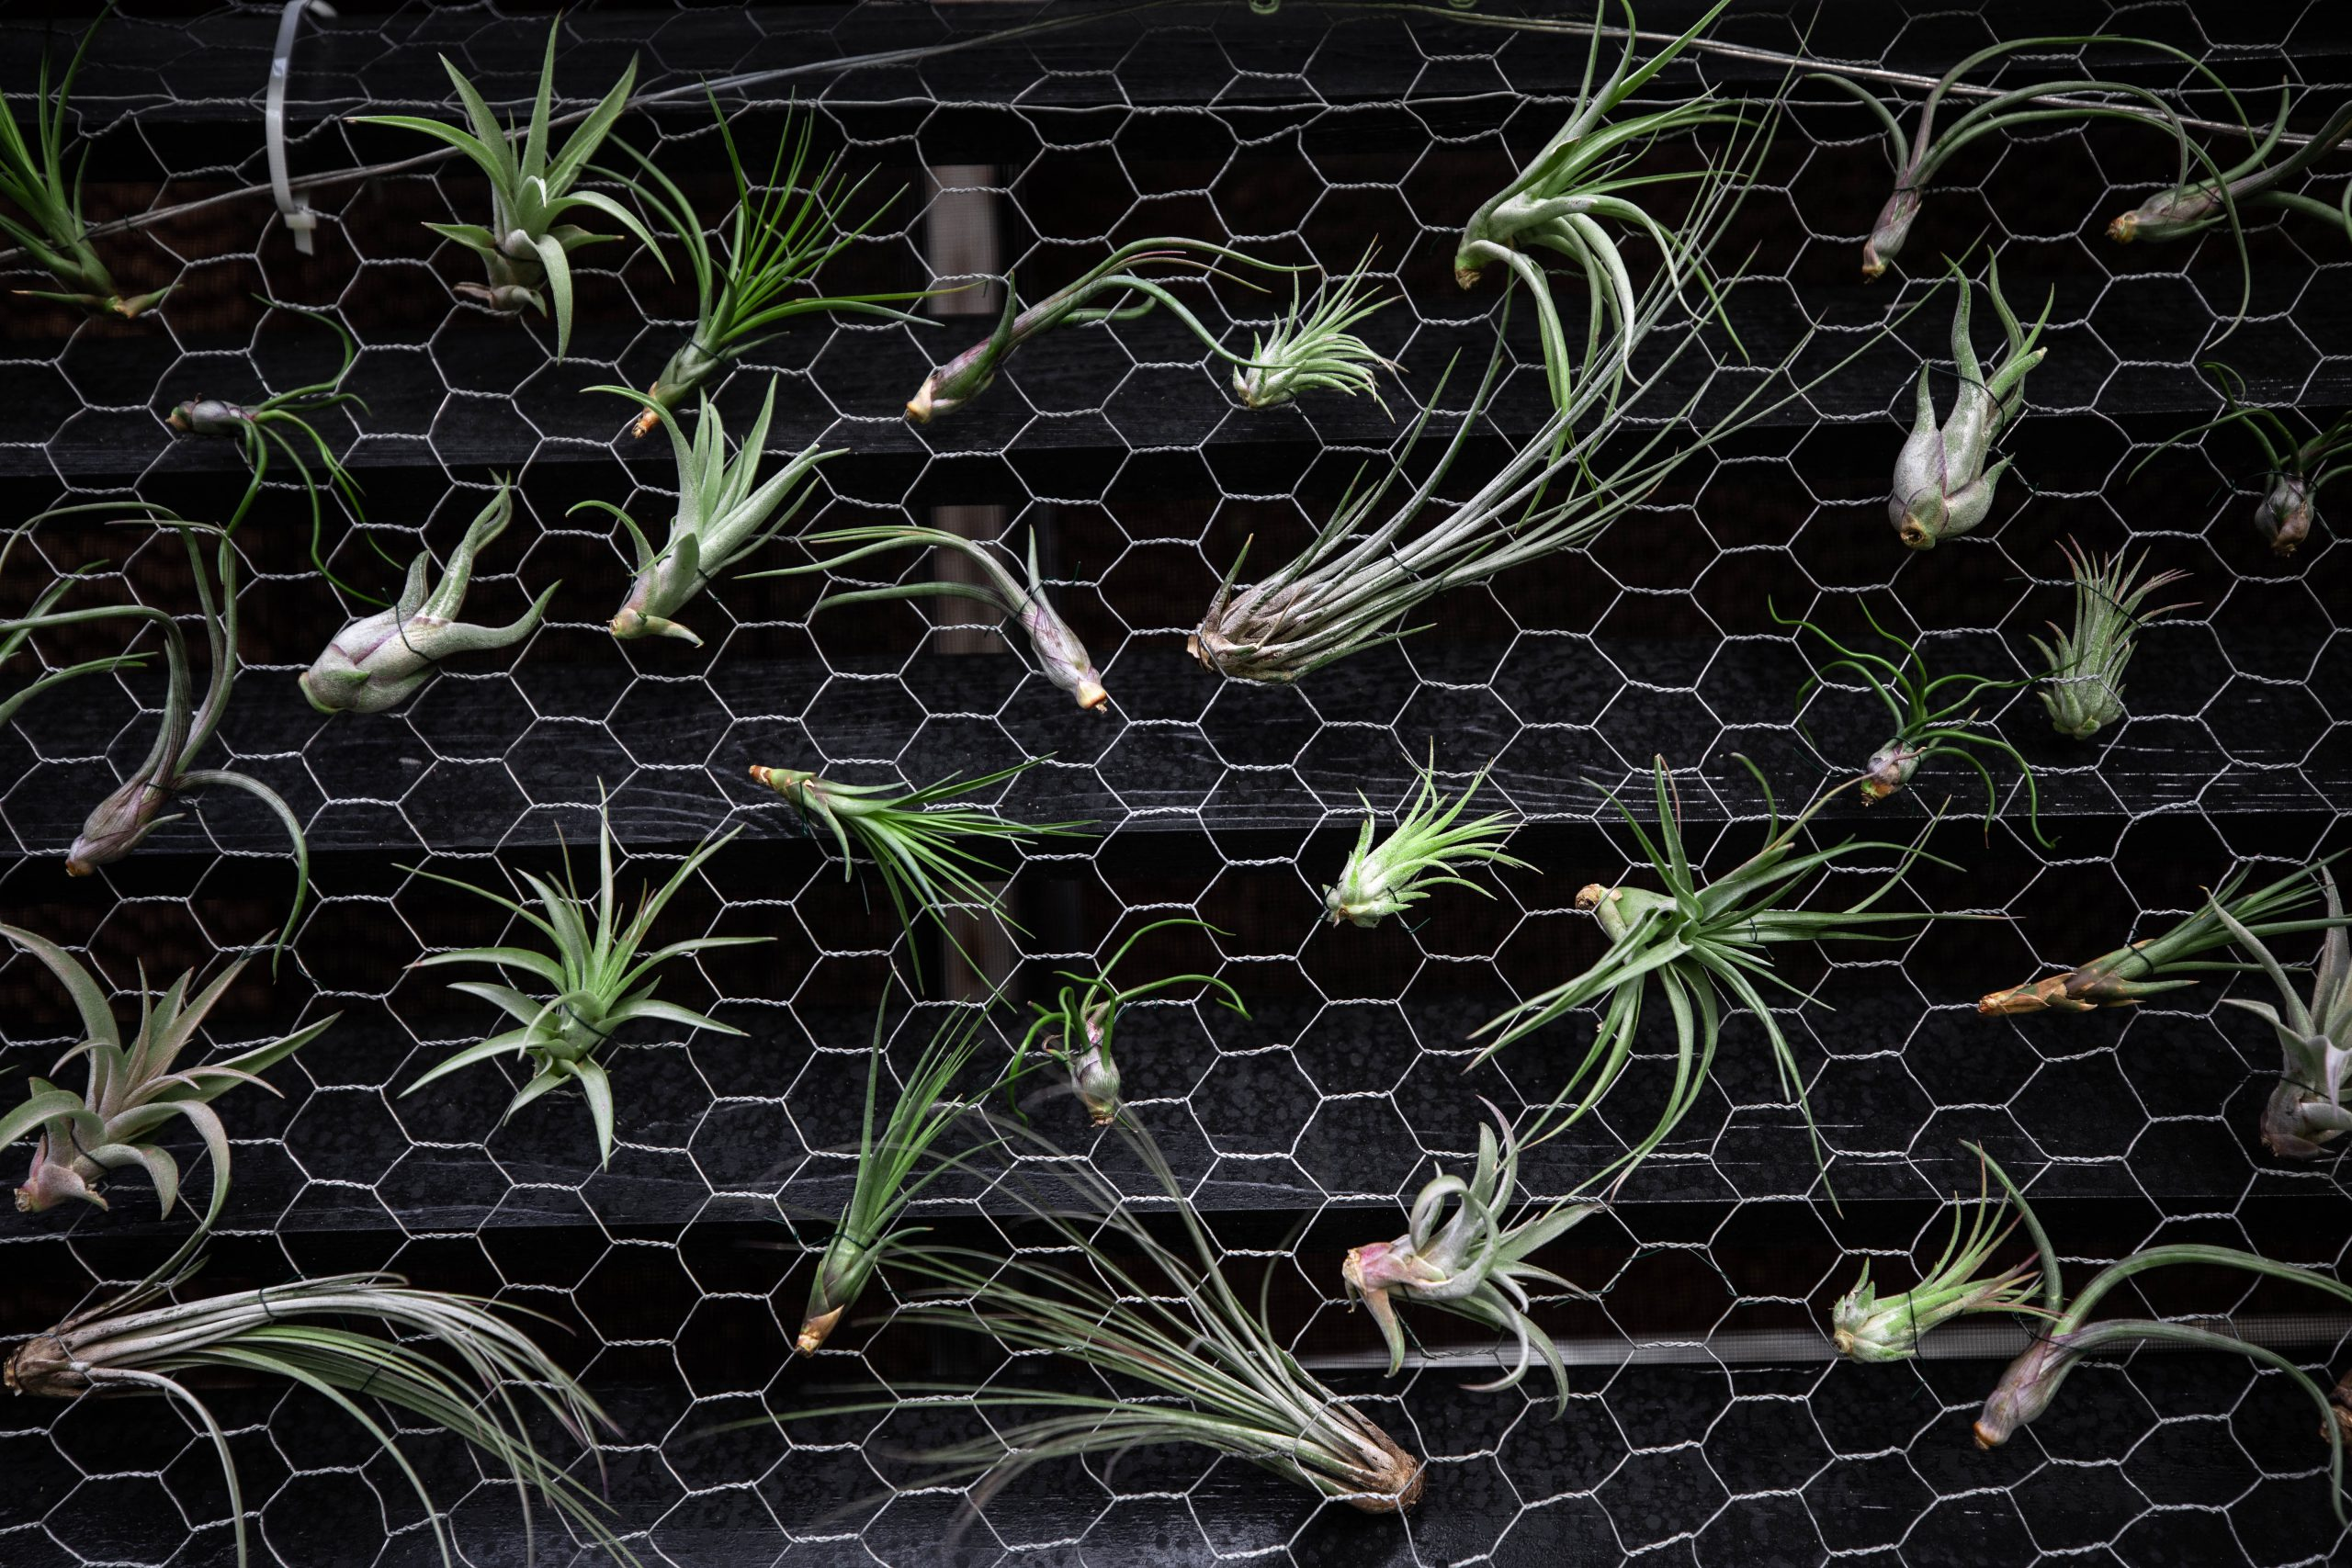 Air Plants Photographed by Luxury Travel Writer Annie Fairfax